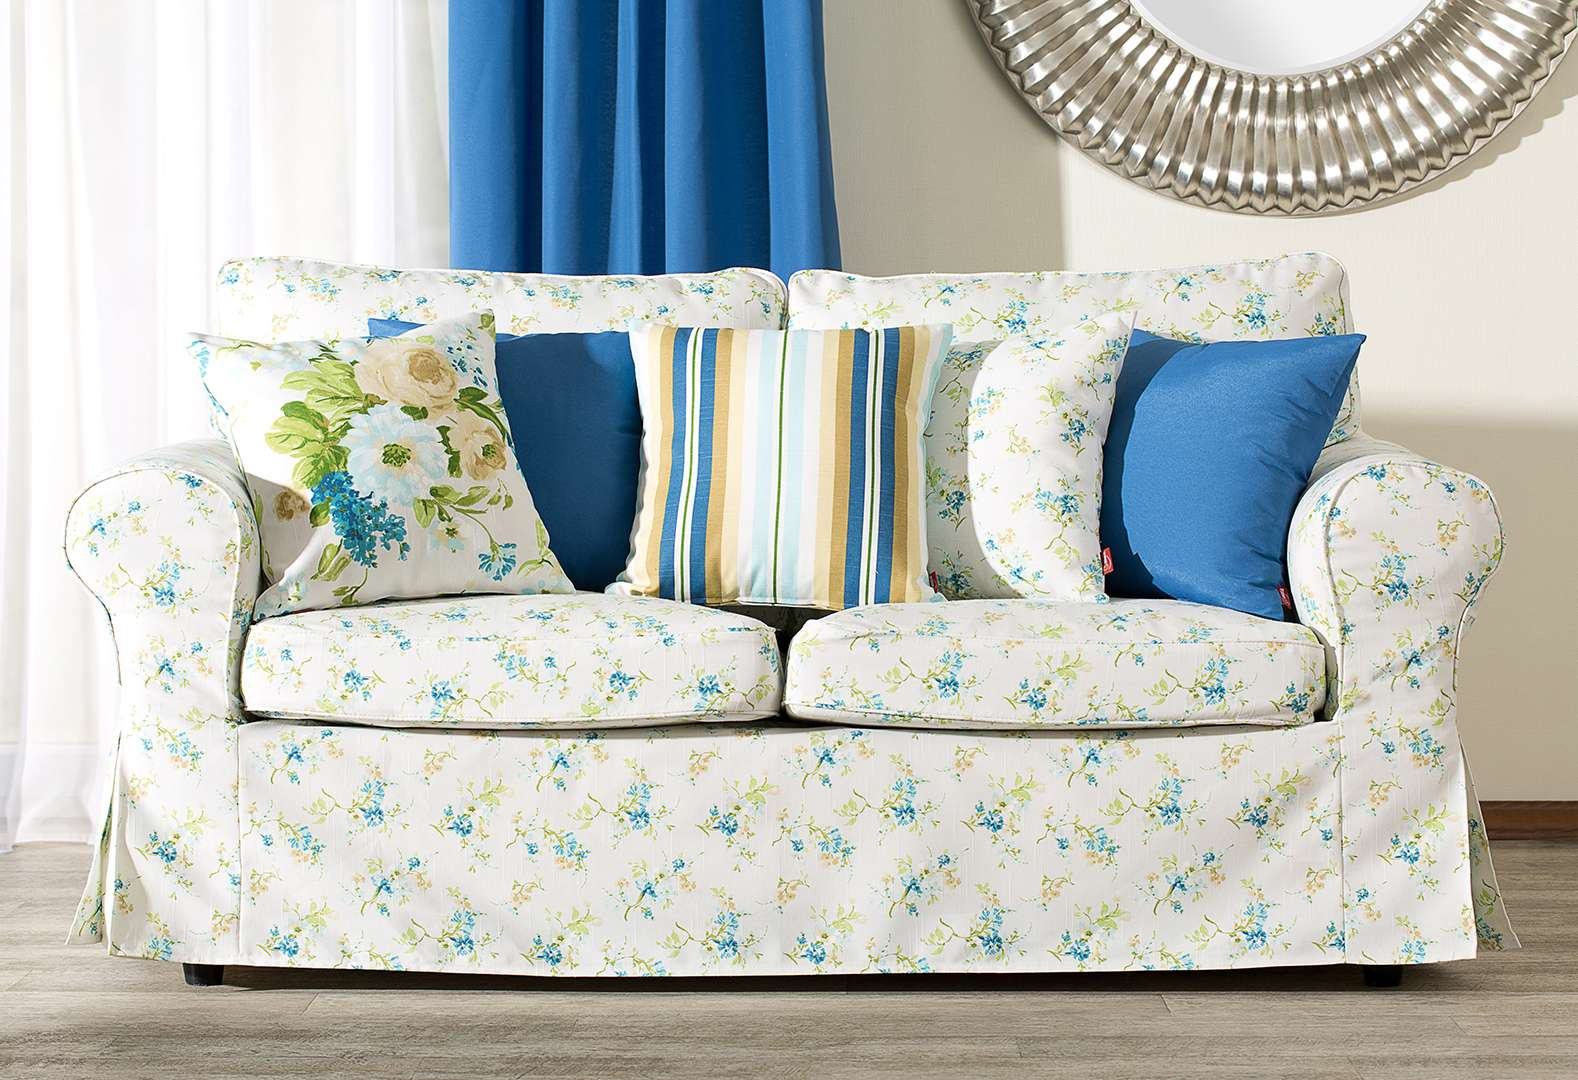 Nappali Mirella - IKEA Ektorp kanapéra való huzattal